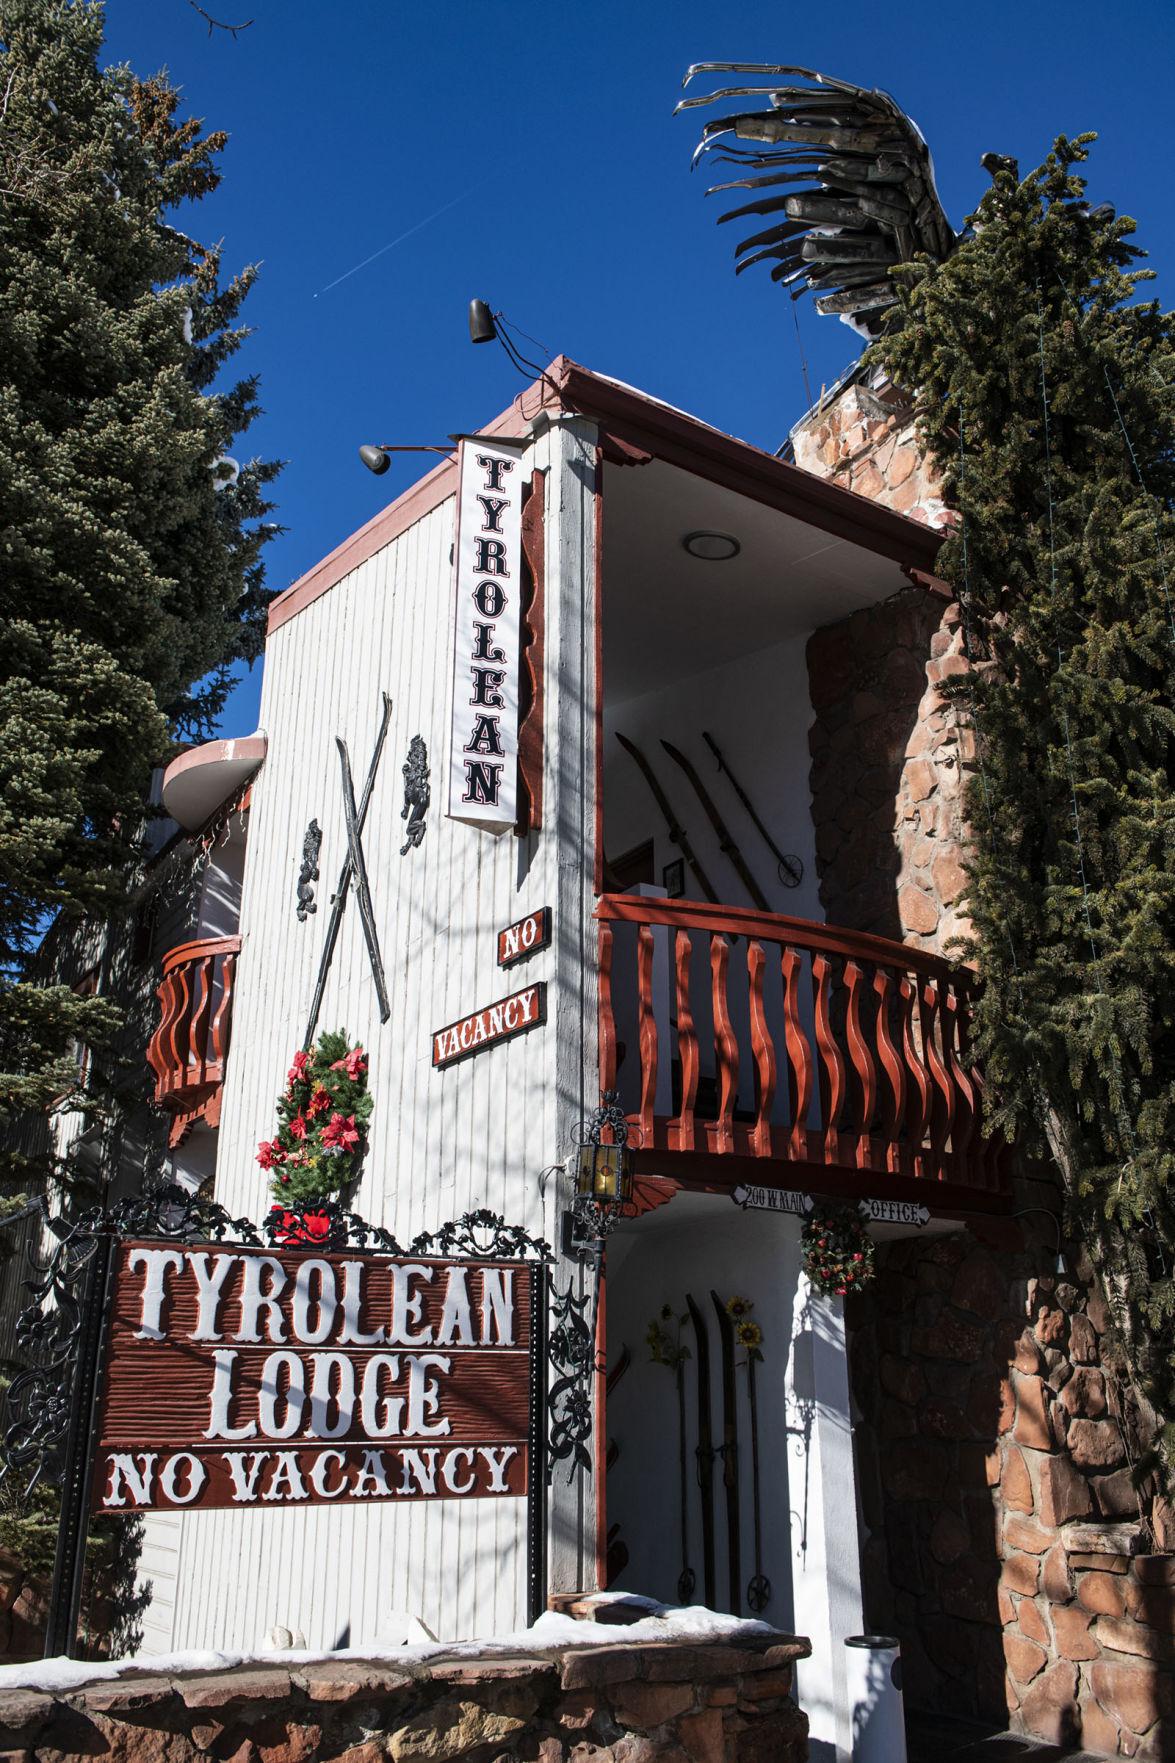 Tyroleran Lodge